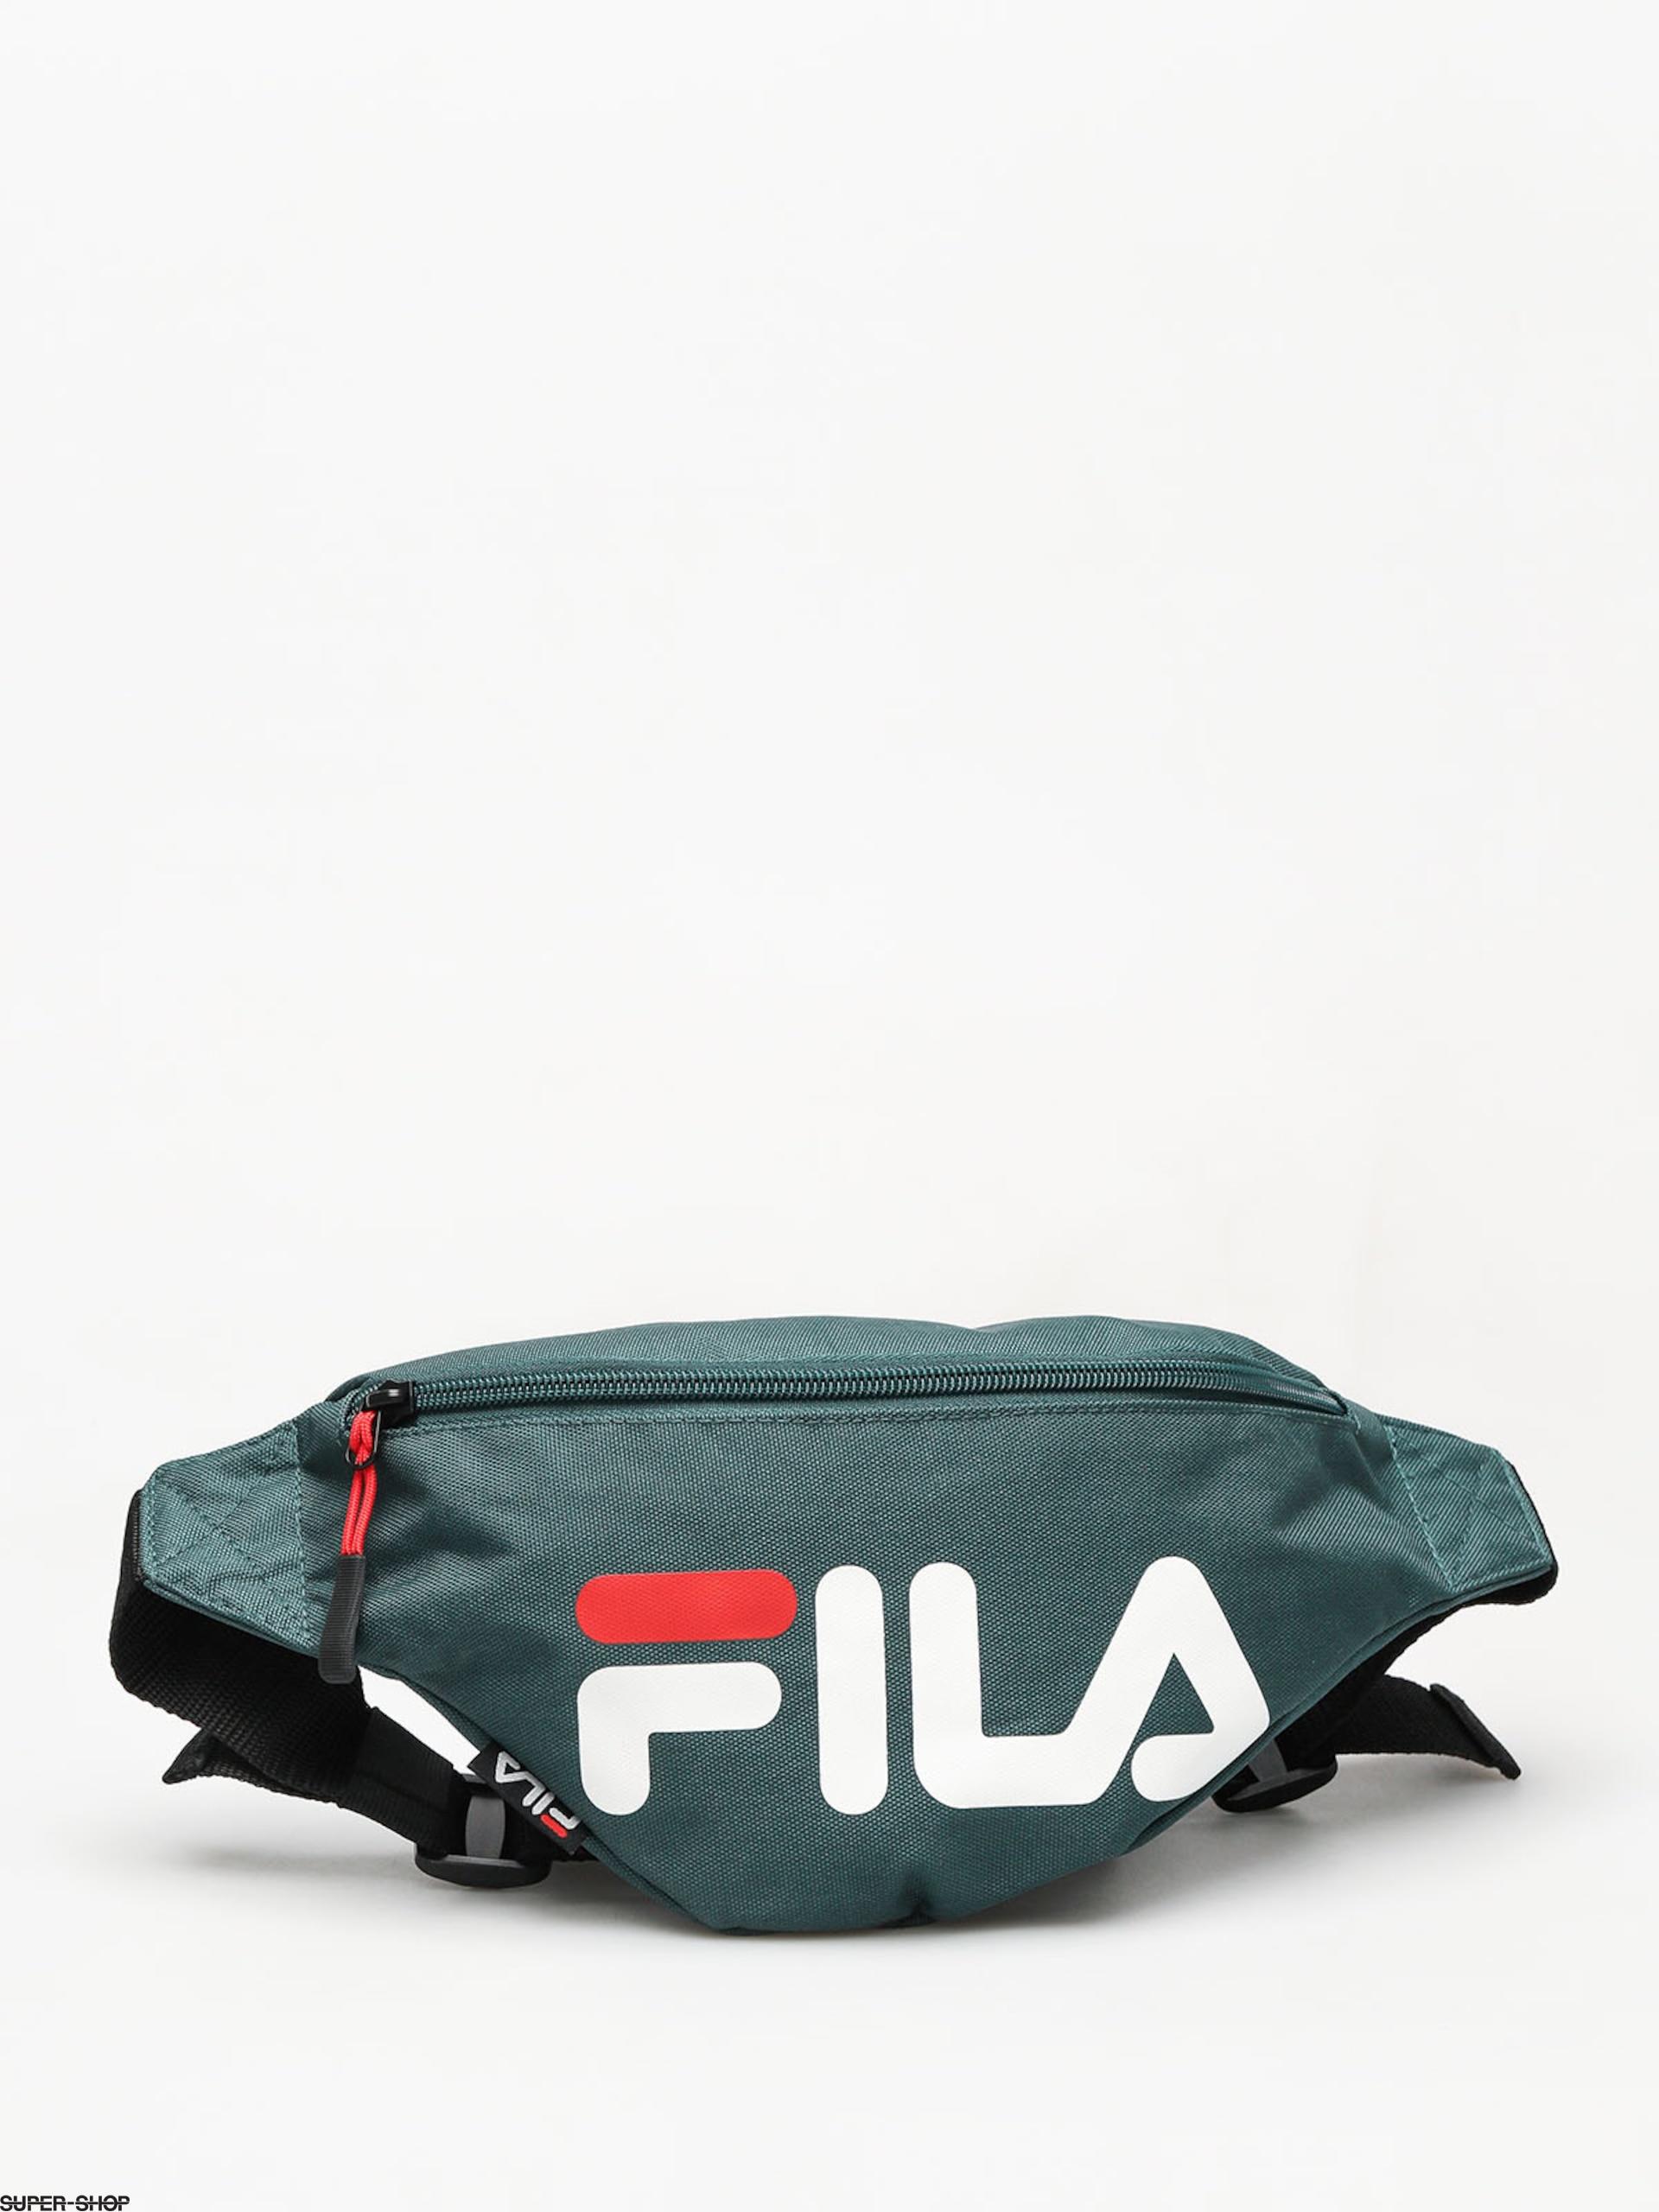 fcac9fc922d4 1002566-w1920-fila-waist-bag-slim-bum-bag-june-bug.jpg